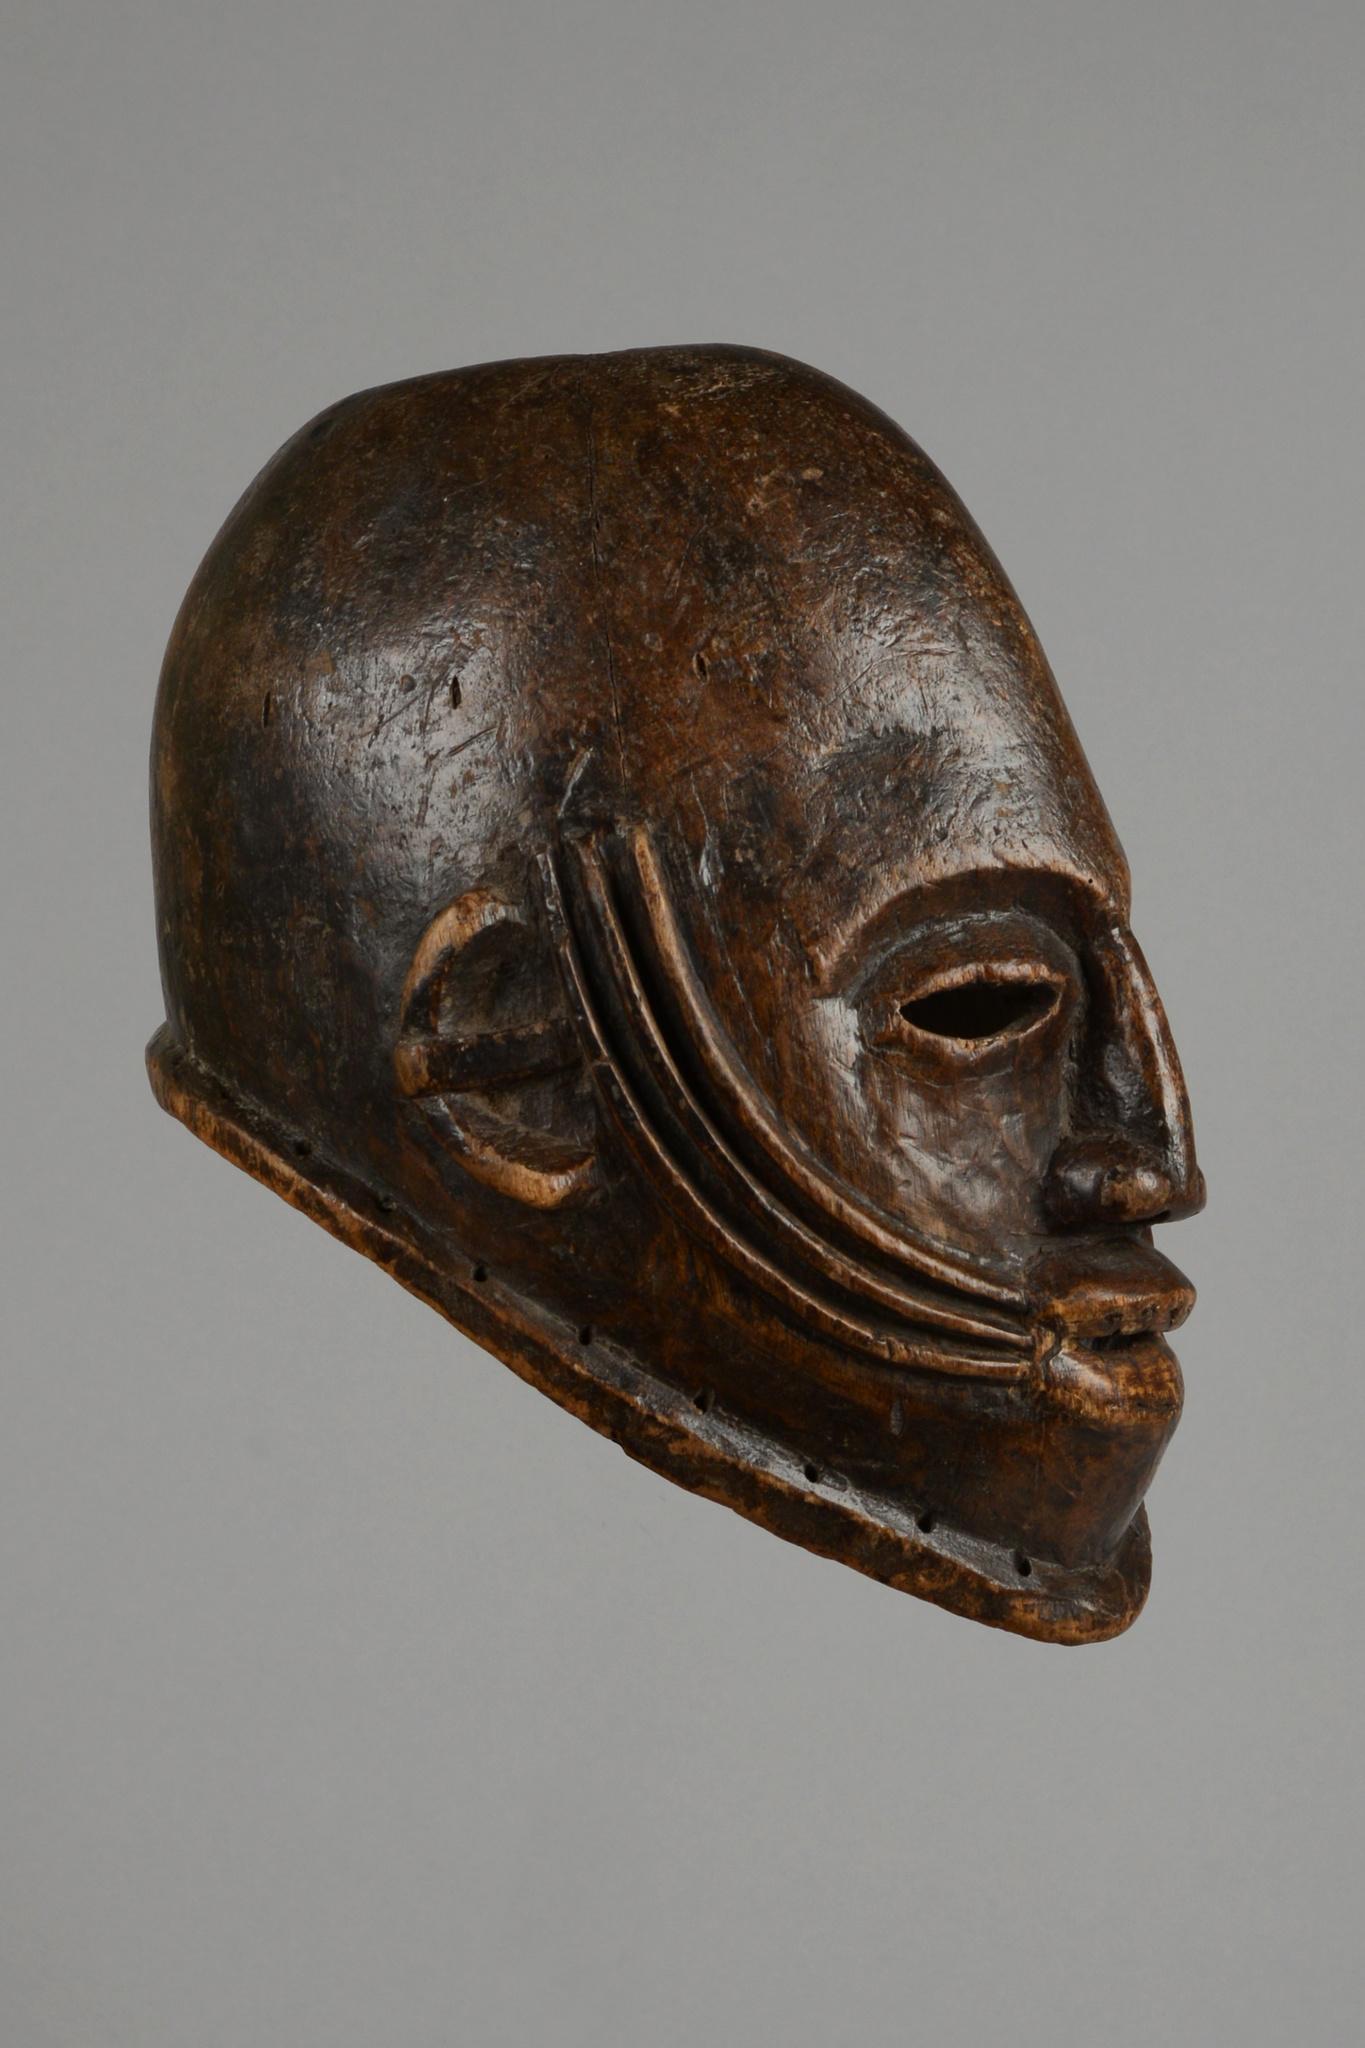 Anthropomorphic helmet mask